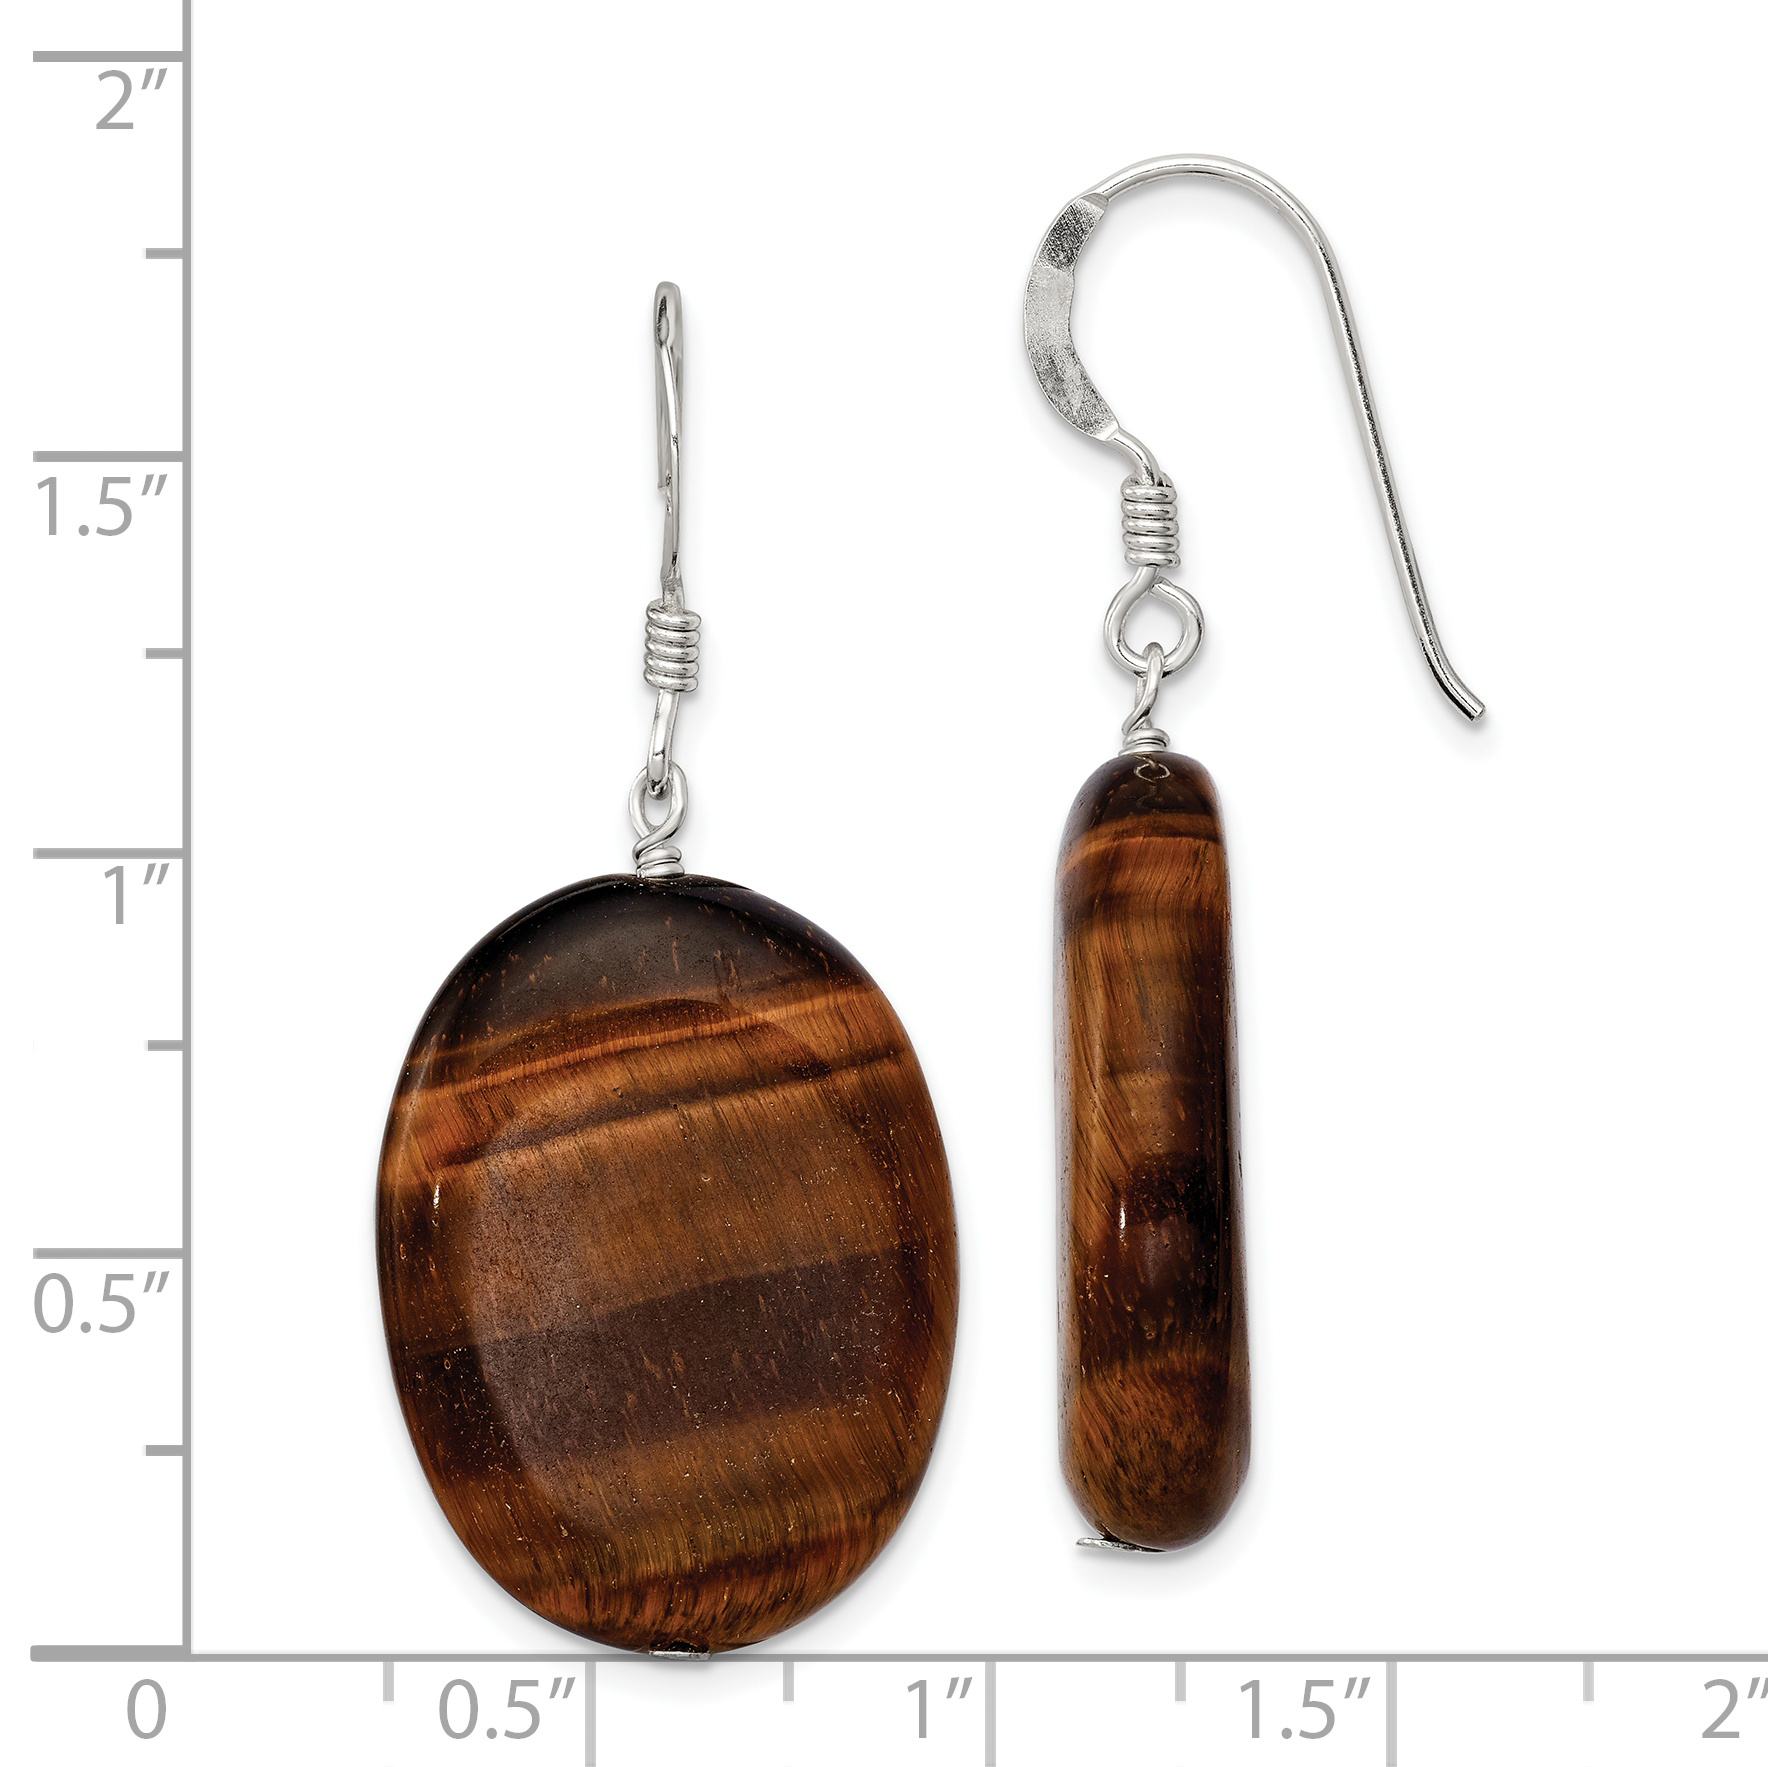 925 Sterling Silver Tigers Eye Drop Dangle Chandelier Earrings Fine Jewelry Gifts For Women For Her - image 1 of 2